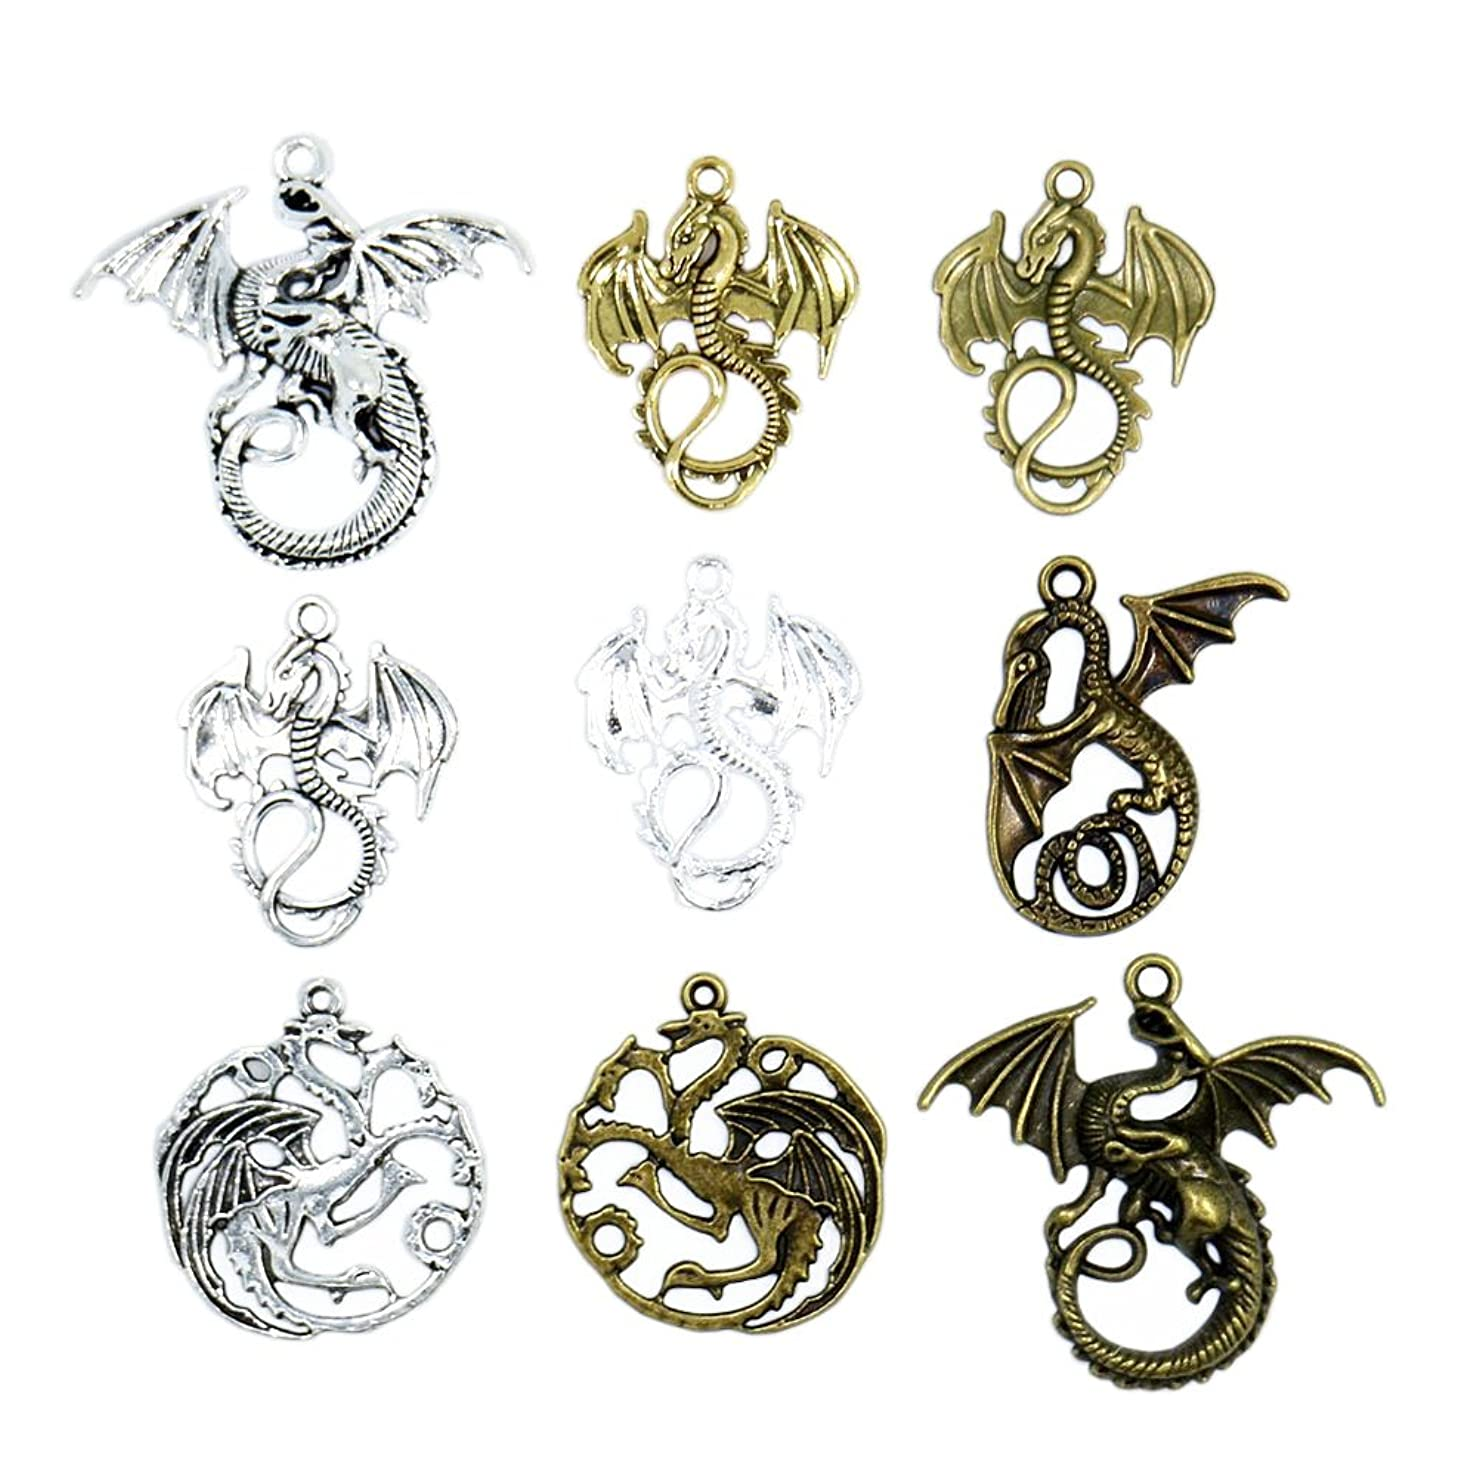 Vintage Metal Dragon Charms Pendant For Jewelry Making Diy Zinc Alloy Animals Dragon Pendant Charms Wholesale 20pcs/lot